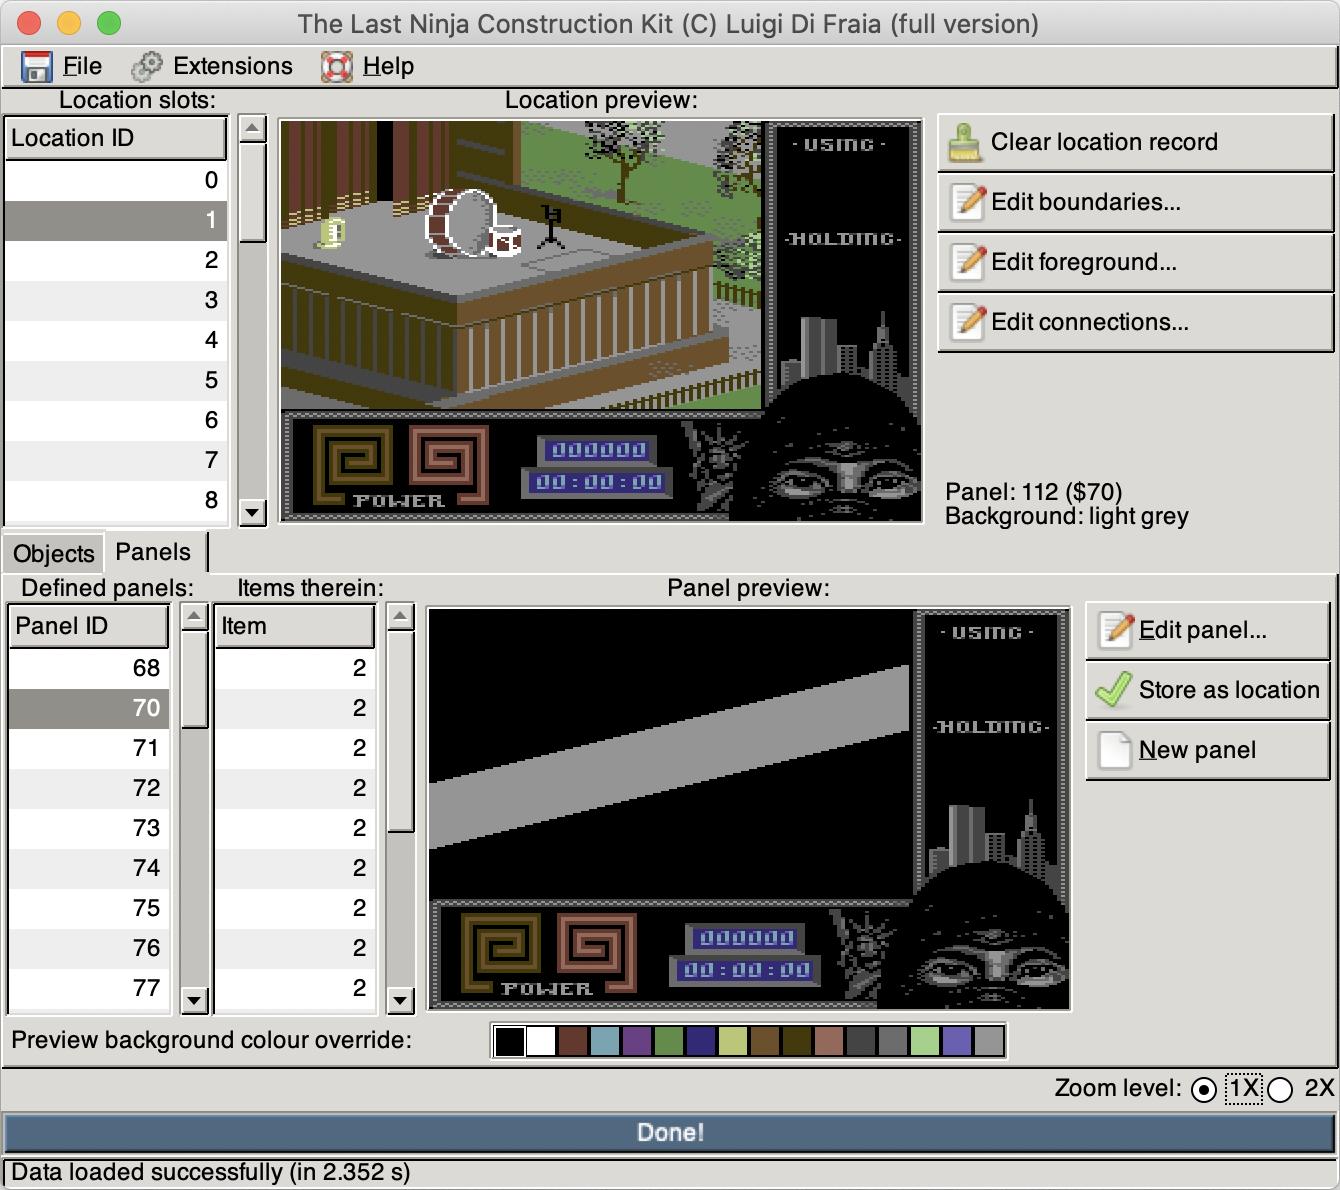 The Last Ninja Construction Kit running on Mac OS X by Luigi Di Fraia